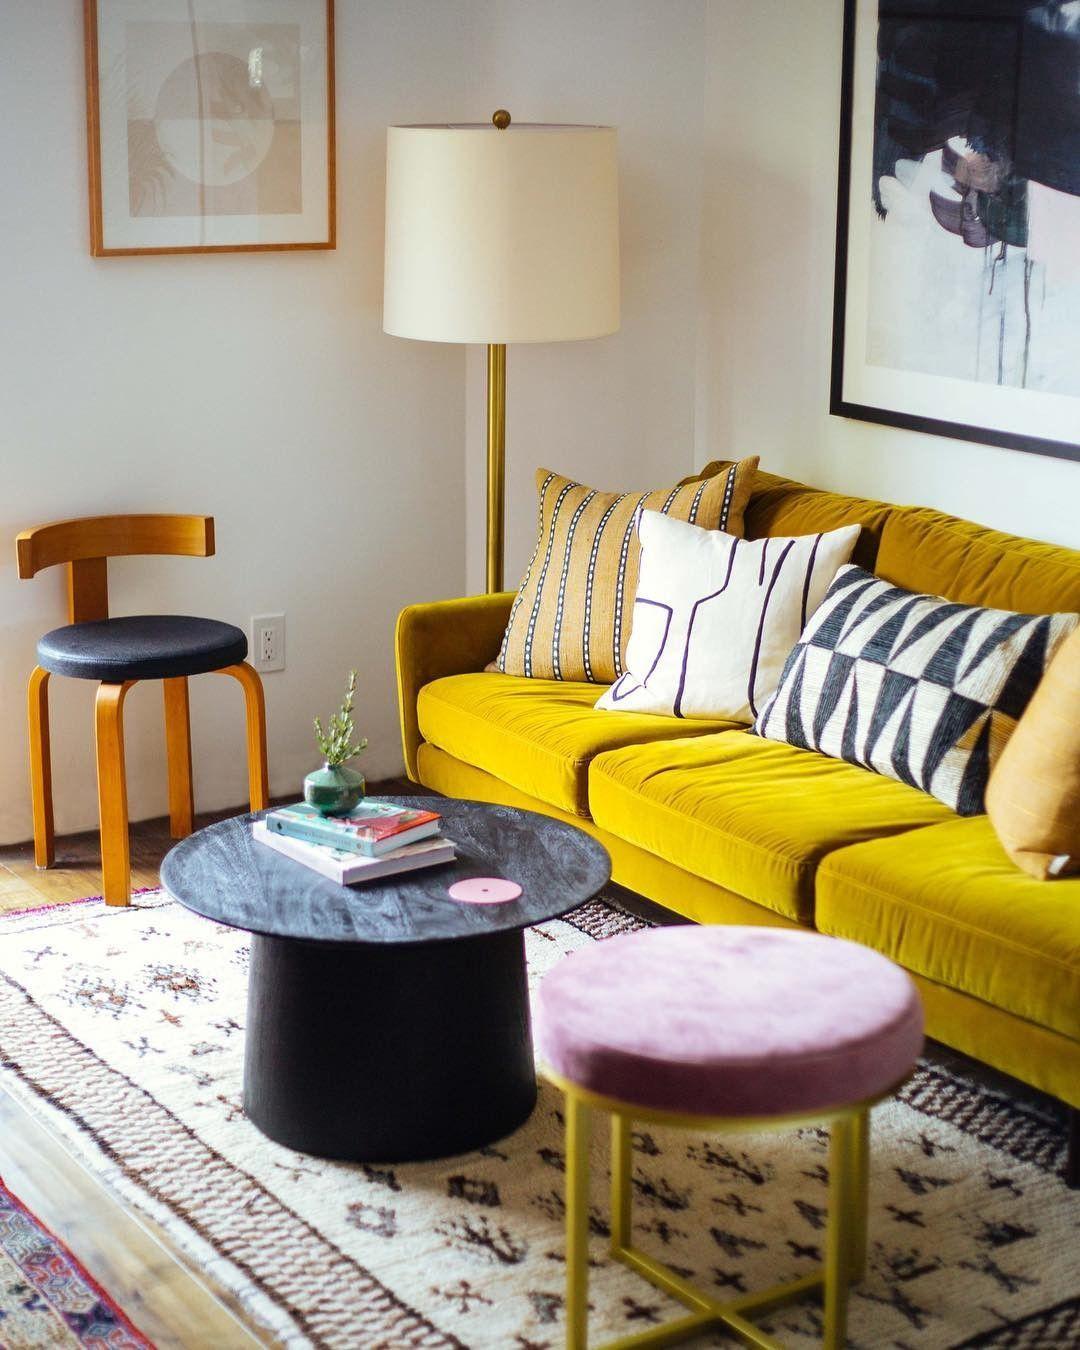 Matrix Yarrow Gold Sofa Sofas Article Modern Mid Century And Scandinavian Furniture Yellow Living Room Yellow Decor Living Room Gold Sofa #yellow #rug #living #room